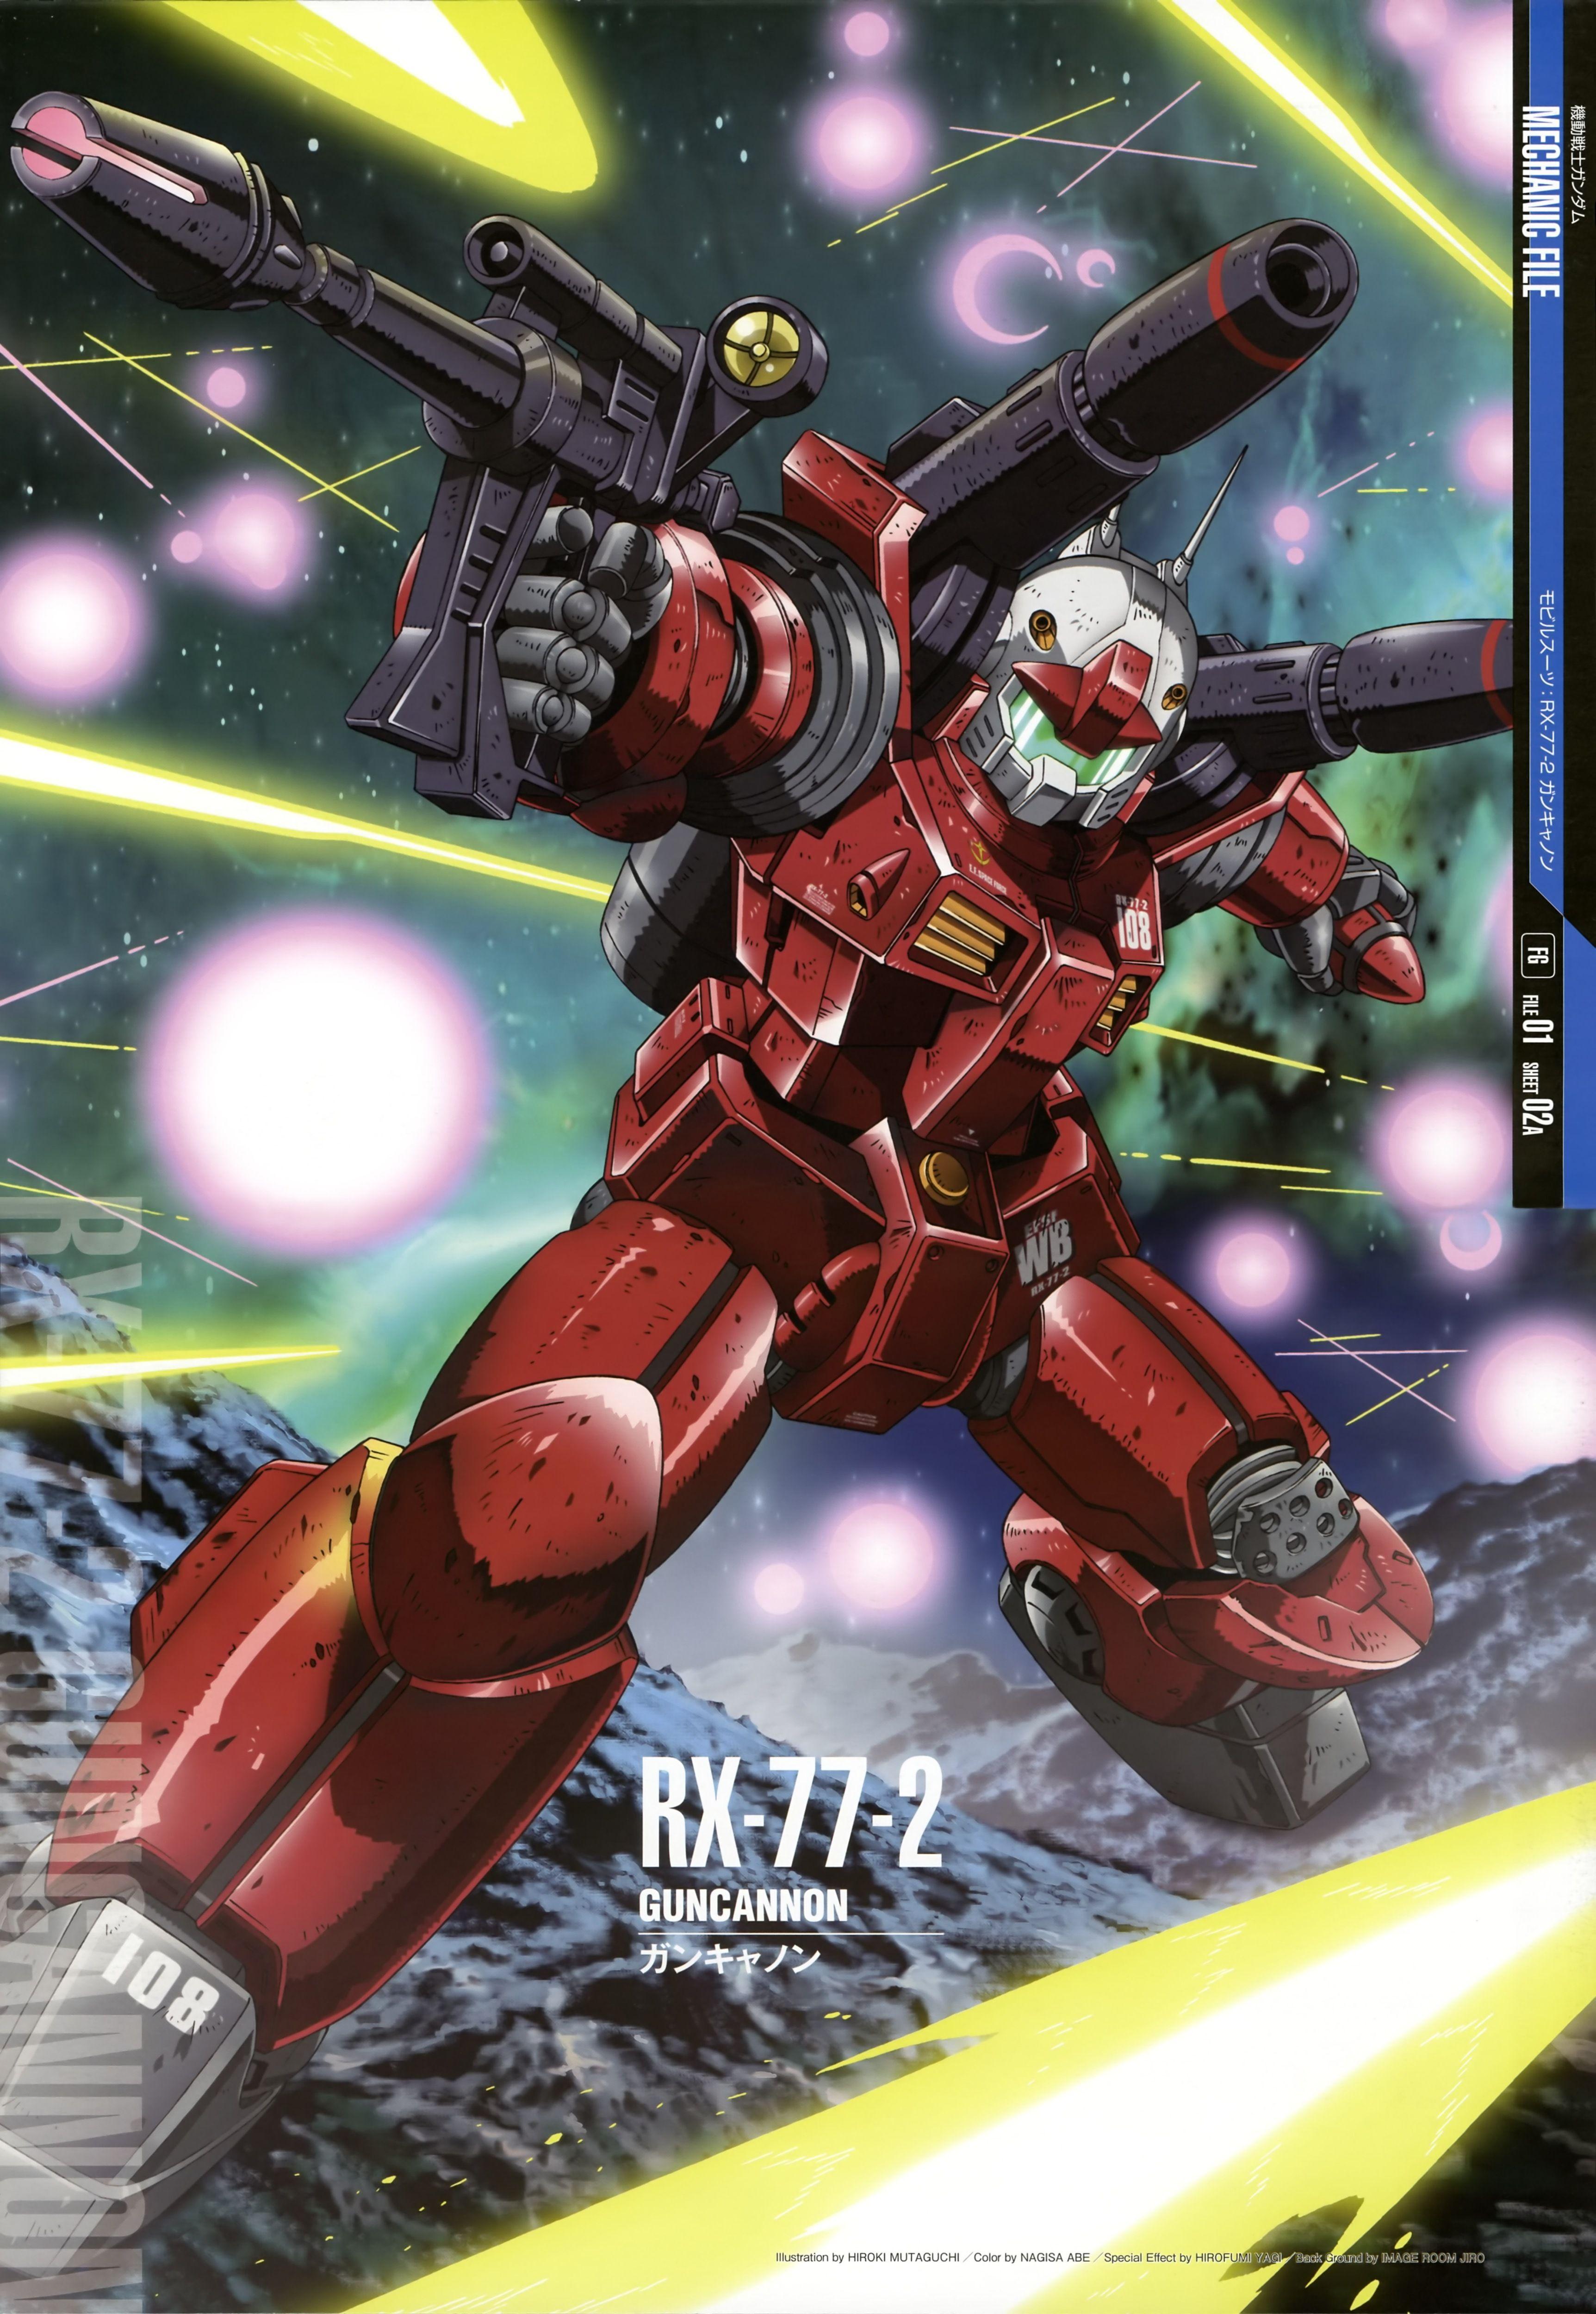 Guncannon Gundam